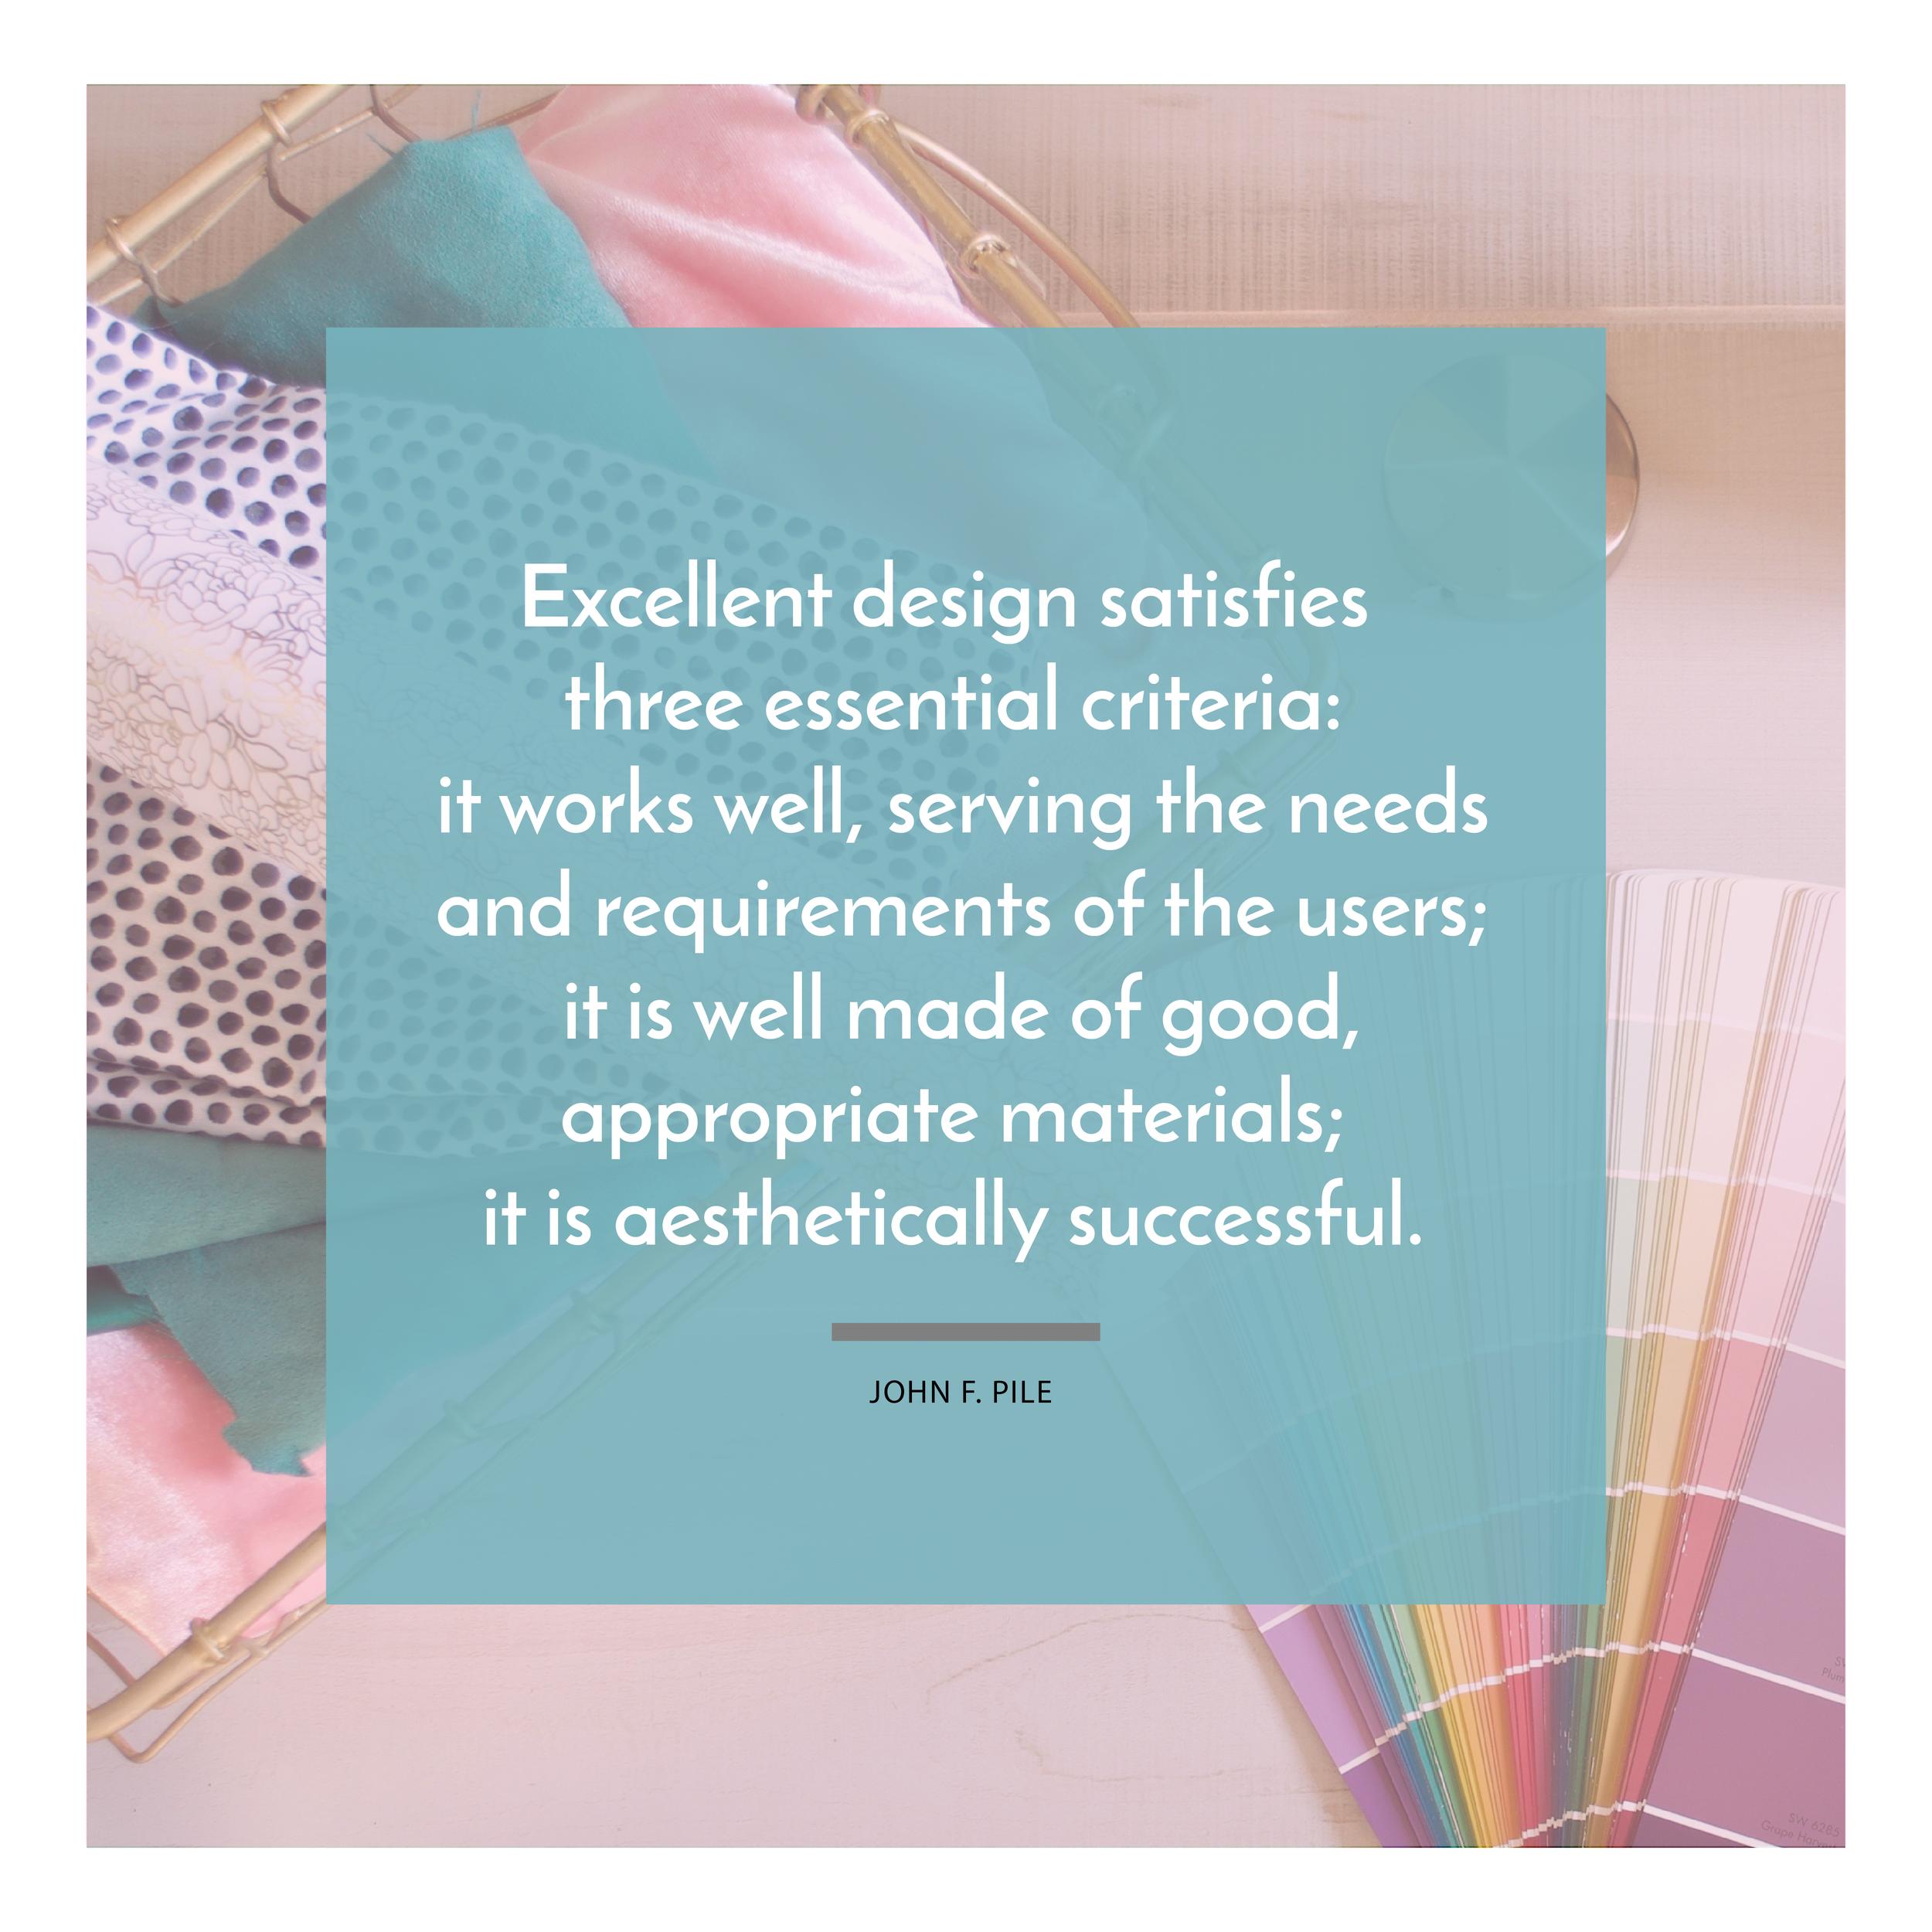 john pile quote defining design-01.png